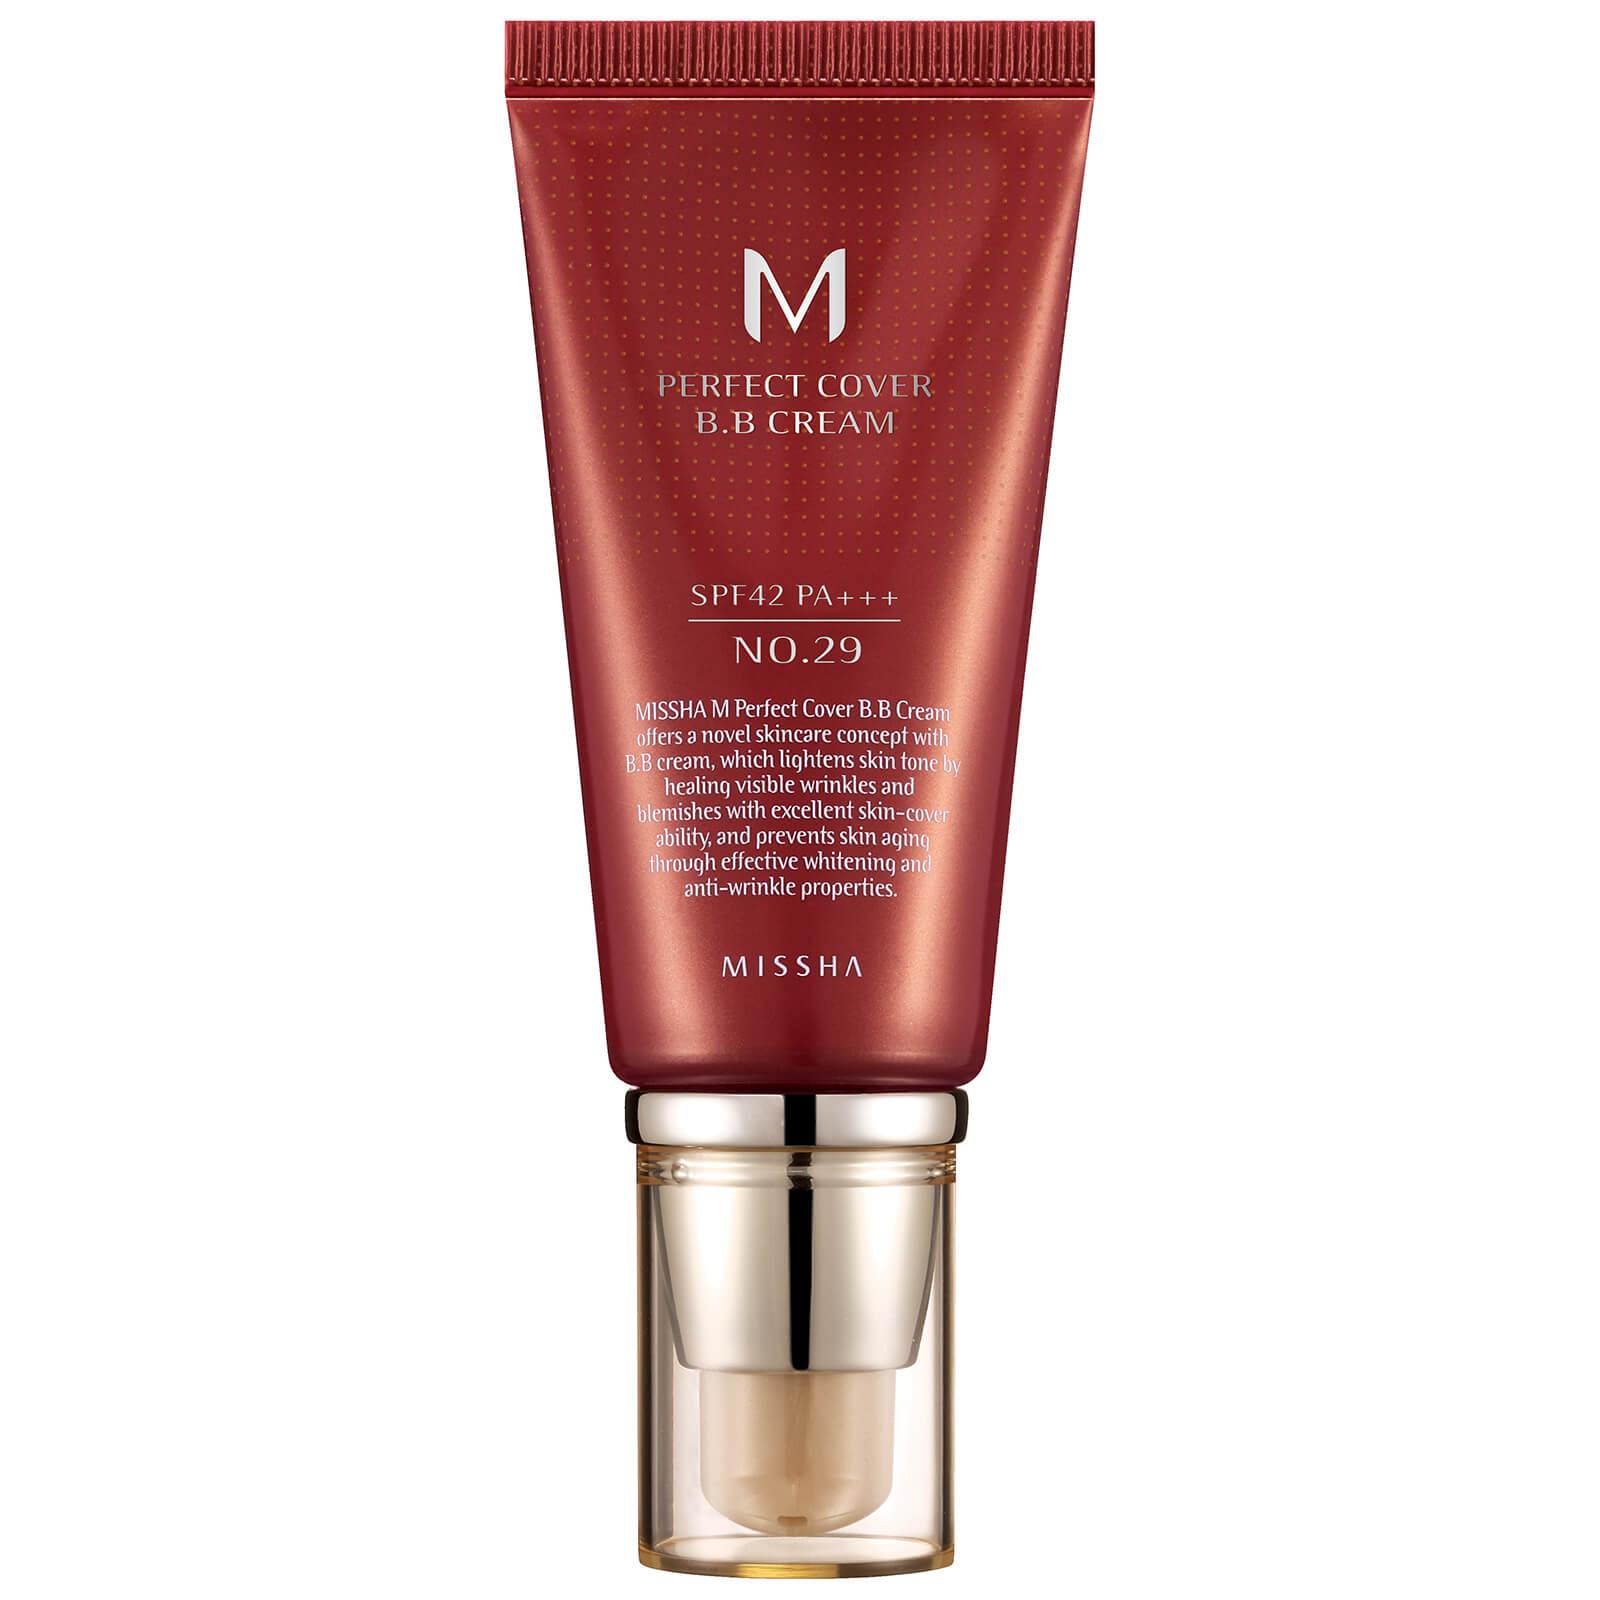 MISSHA M Perfect Cover BB Cream SPF42/PA+++ - No.29/Caramel Beige 50ml -  LOOKFANTASTIC